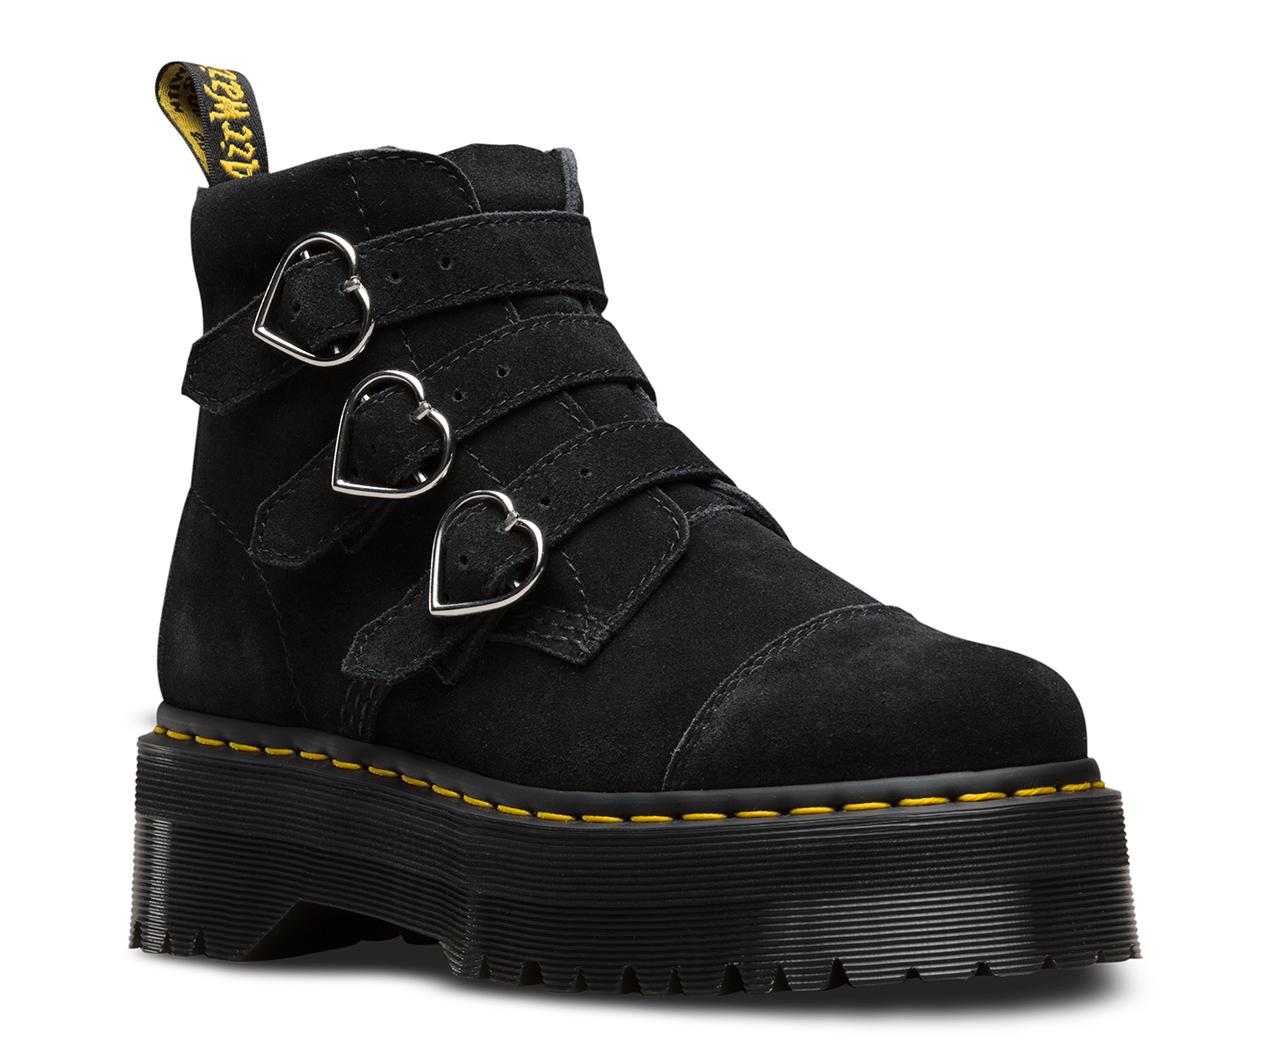 Website To Order Shoes Online